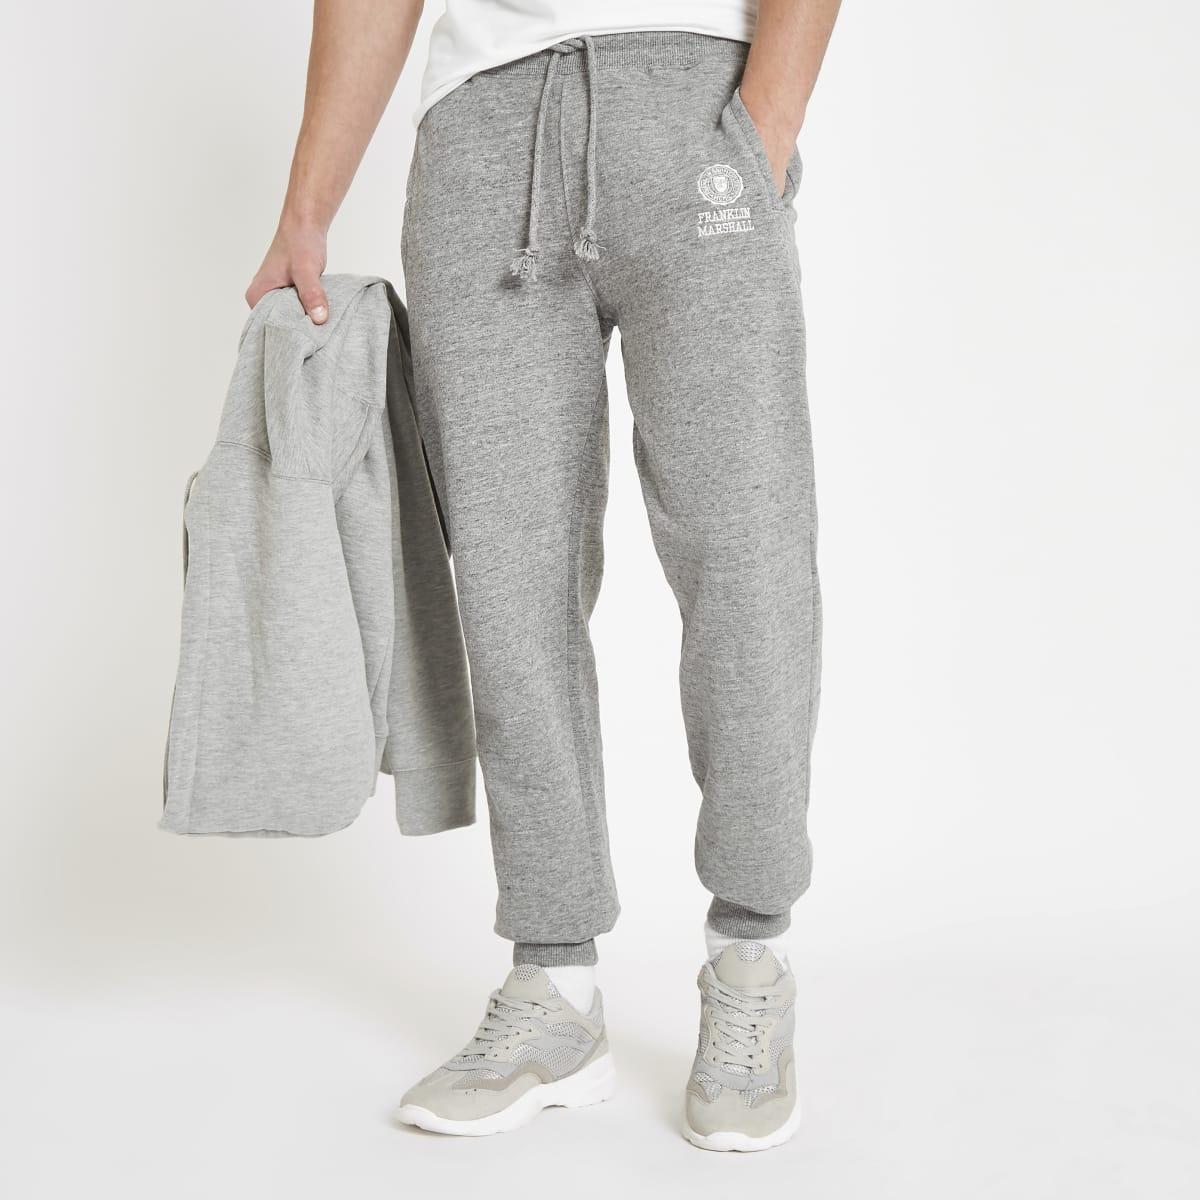 Franklin & Marshall – Pantalon de jogging en molleton gris